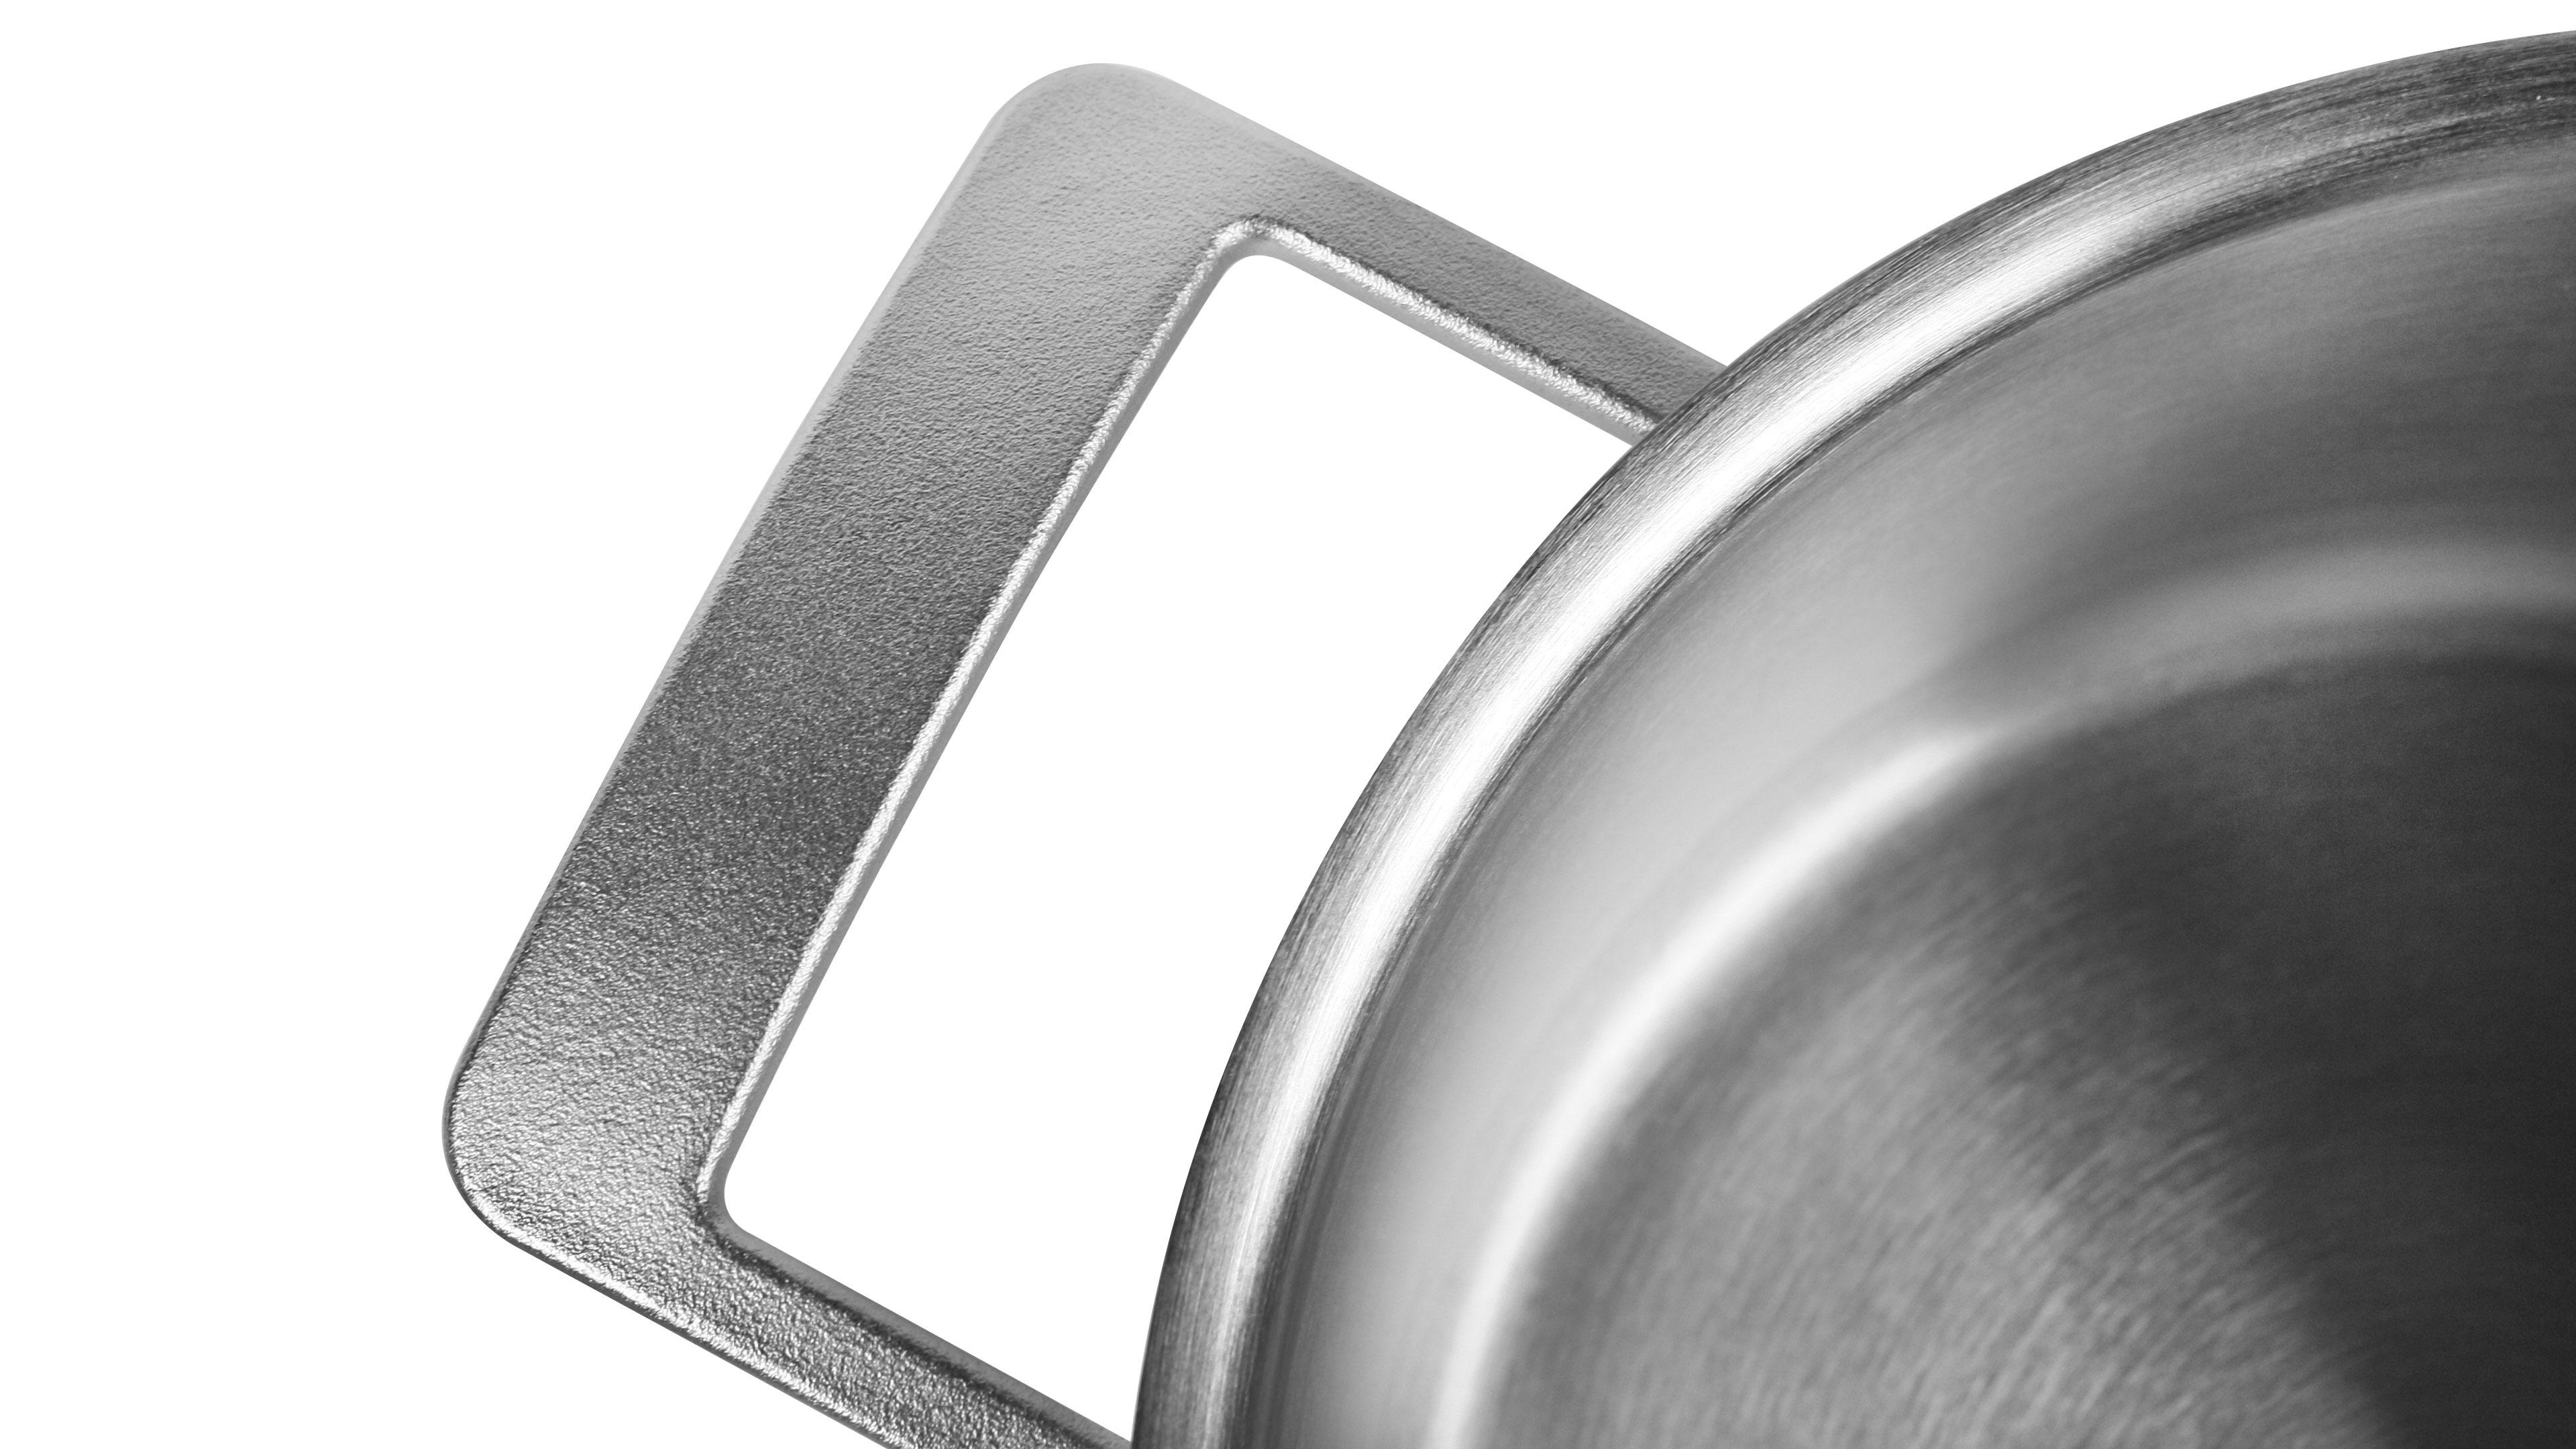 Demeyere Industry5 Stainless Steel Cookware Set 10 Piece